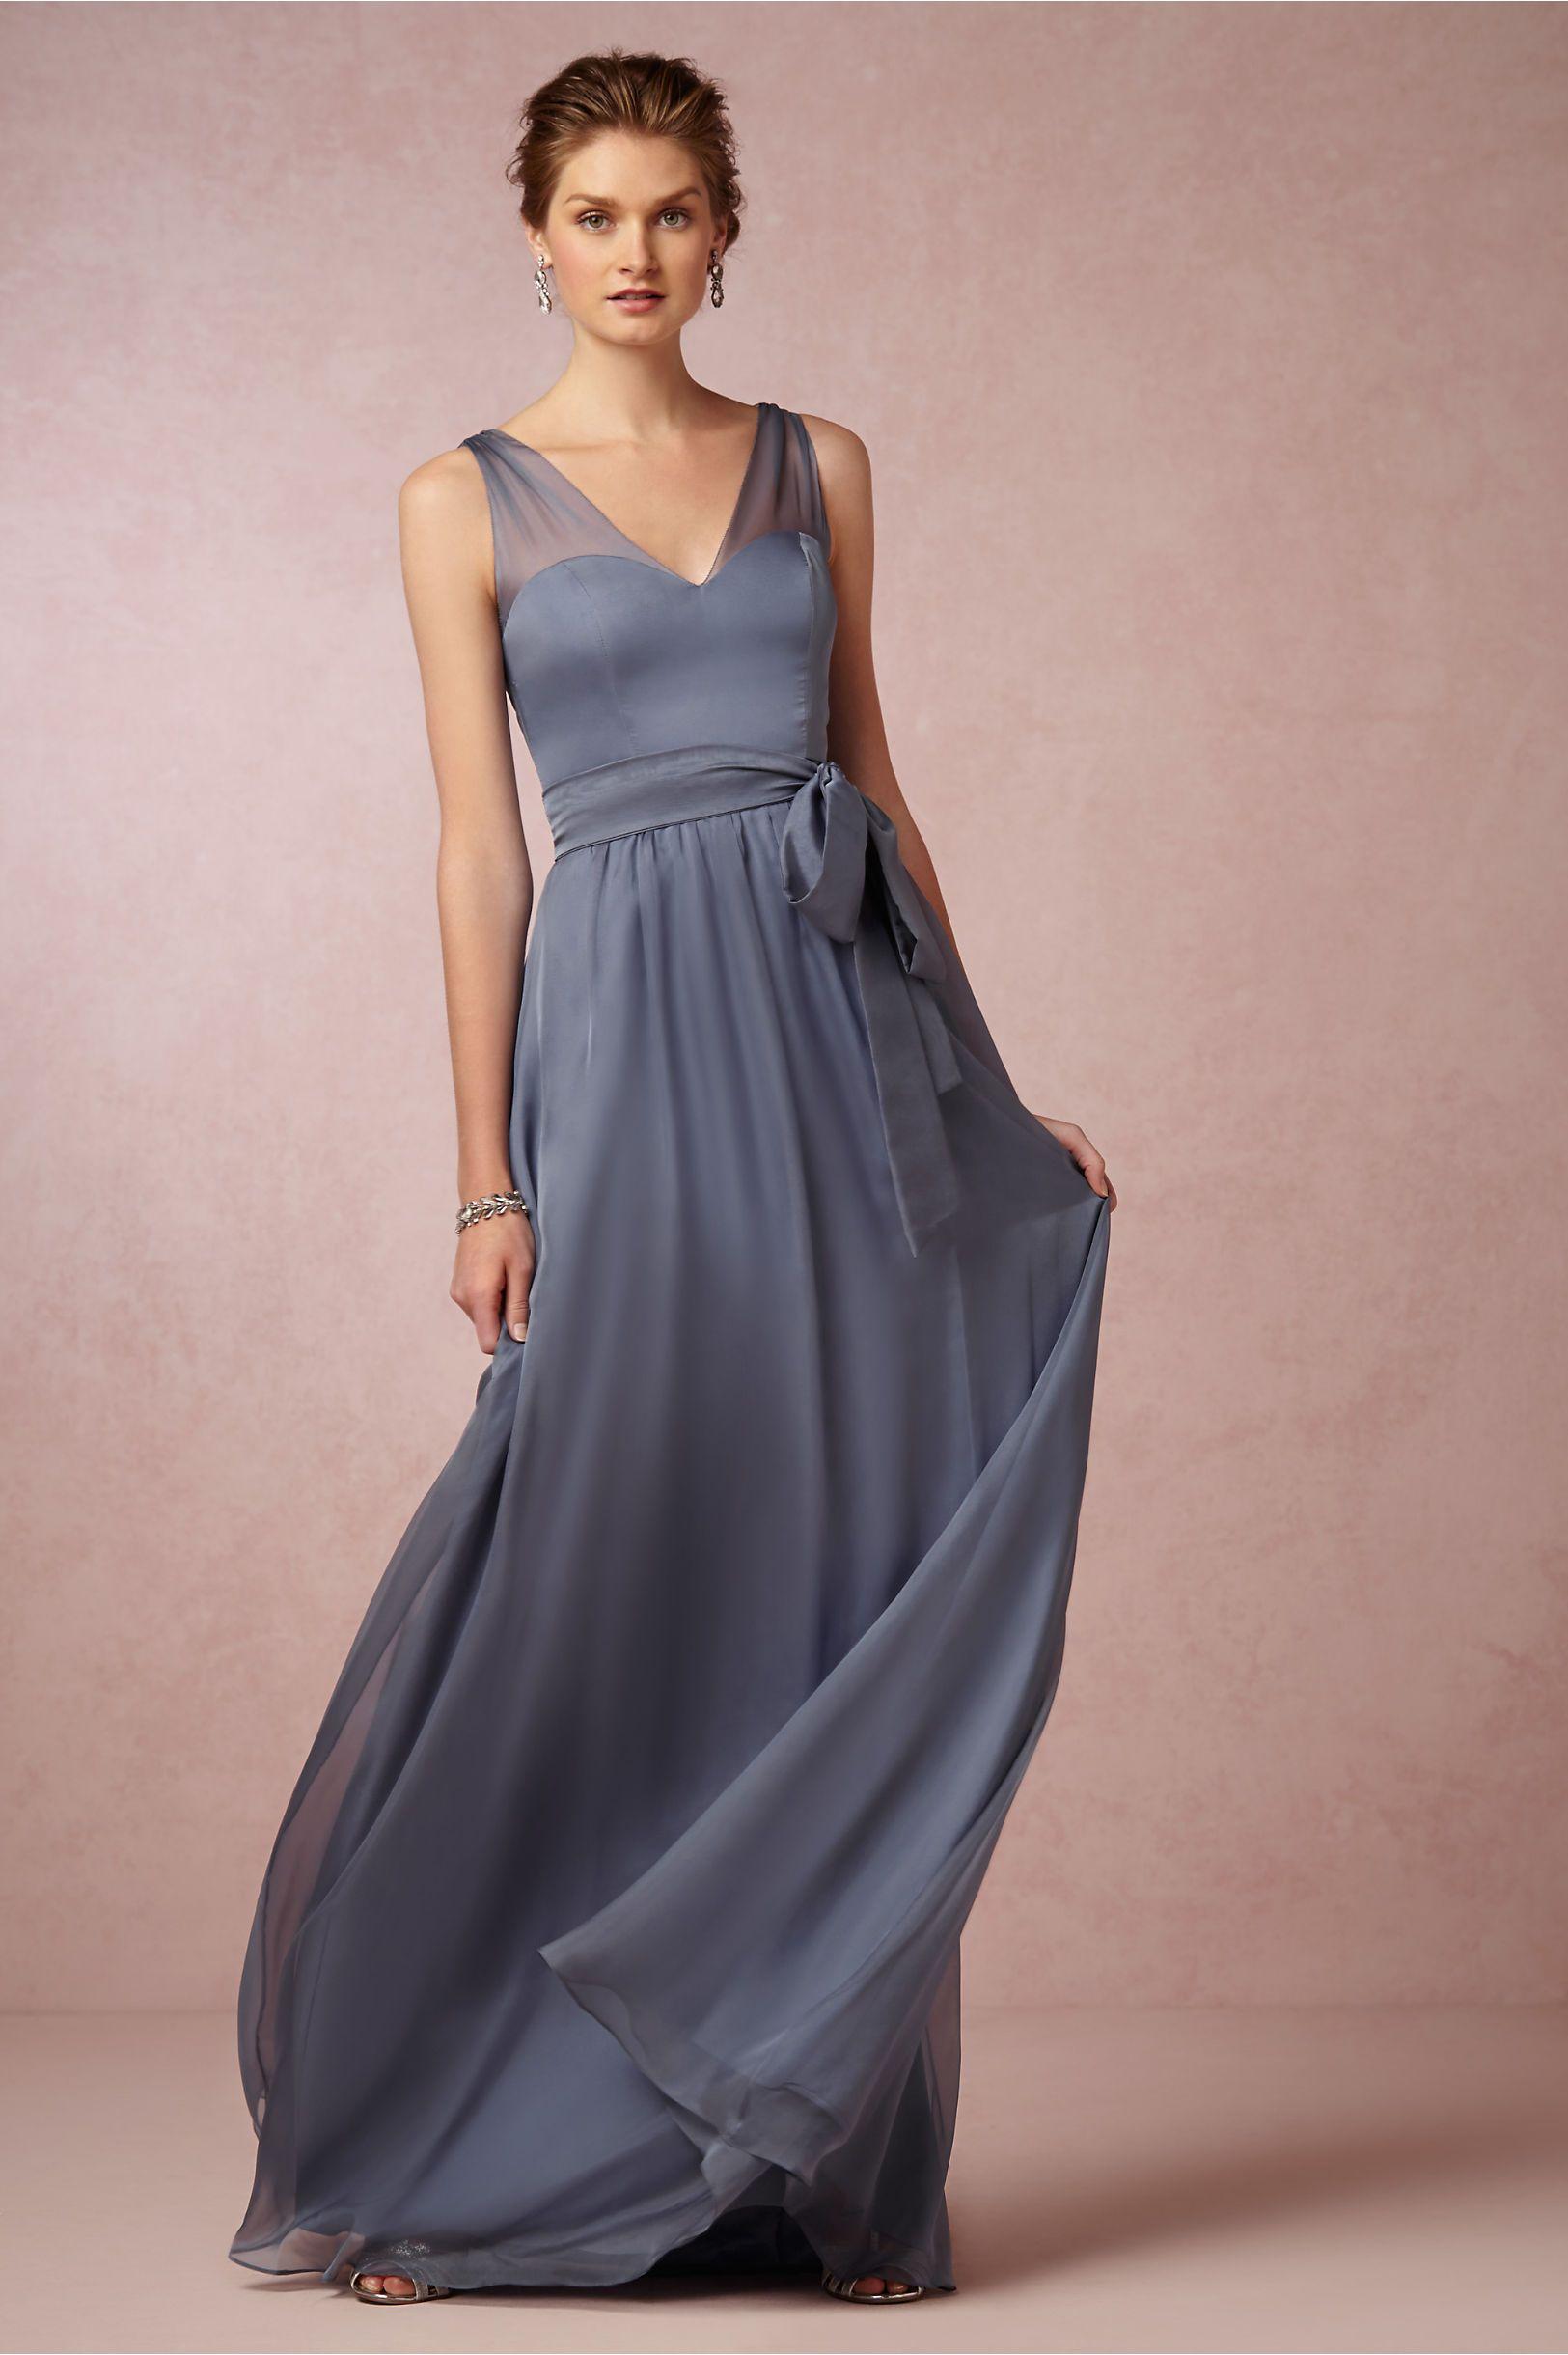 Josephine dress in steel blue from bhldn bridesmaid dresses josephine dress in steel blue from bhldn bridesmaid dress colorsblue ombrellifo Images